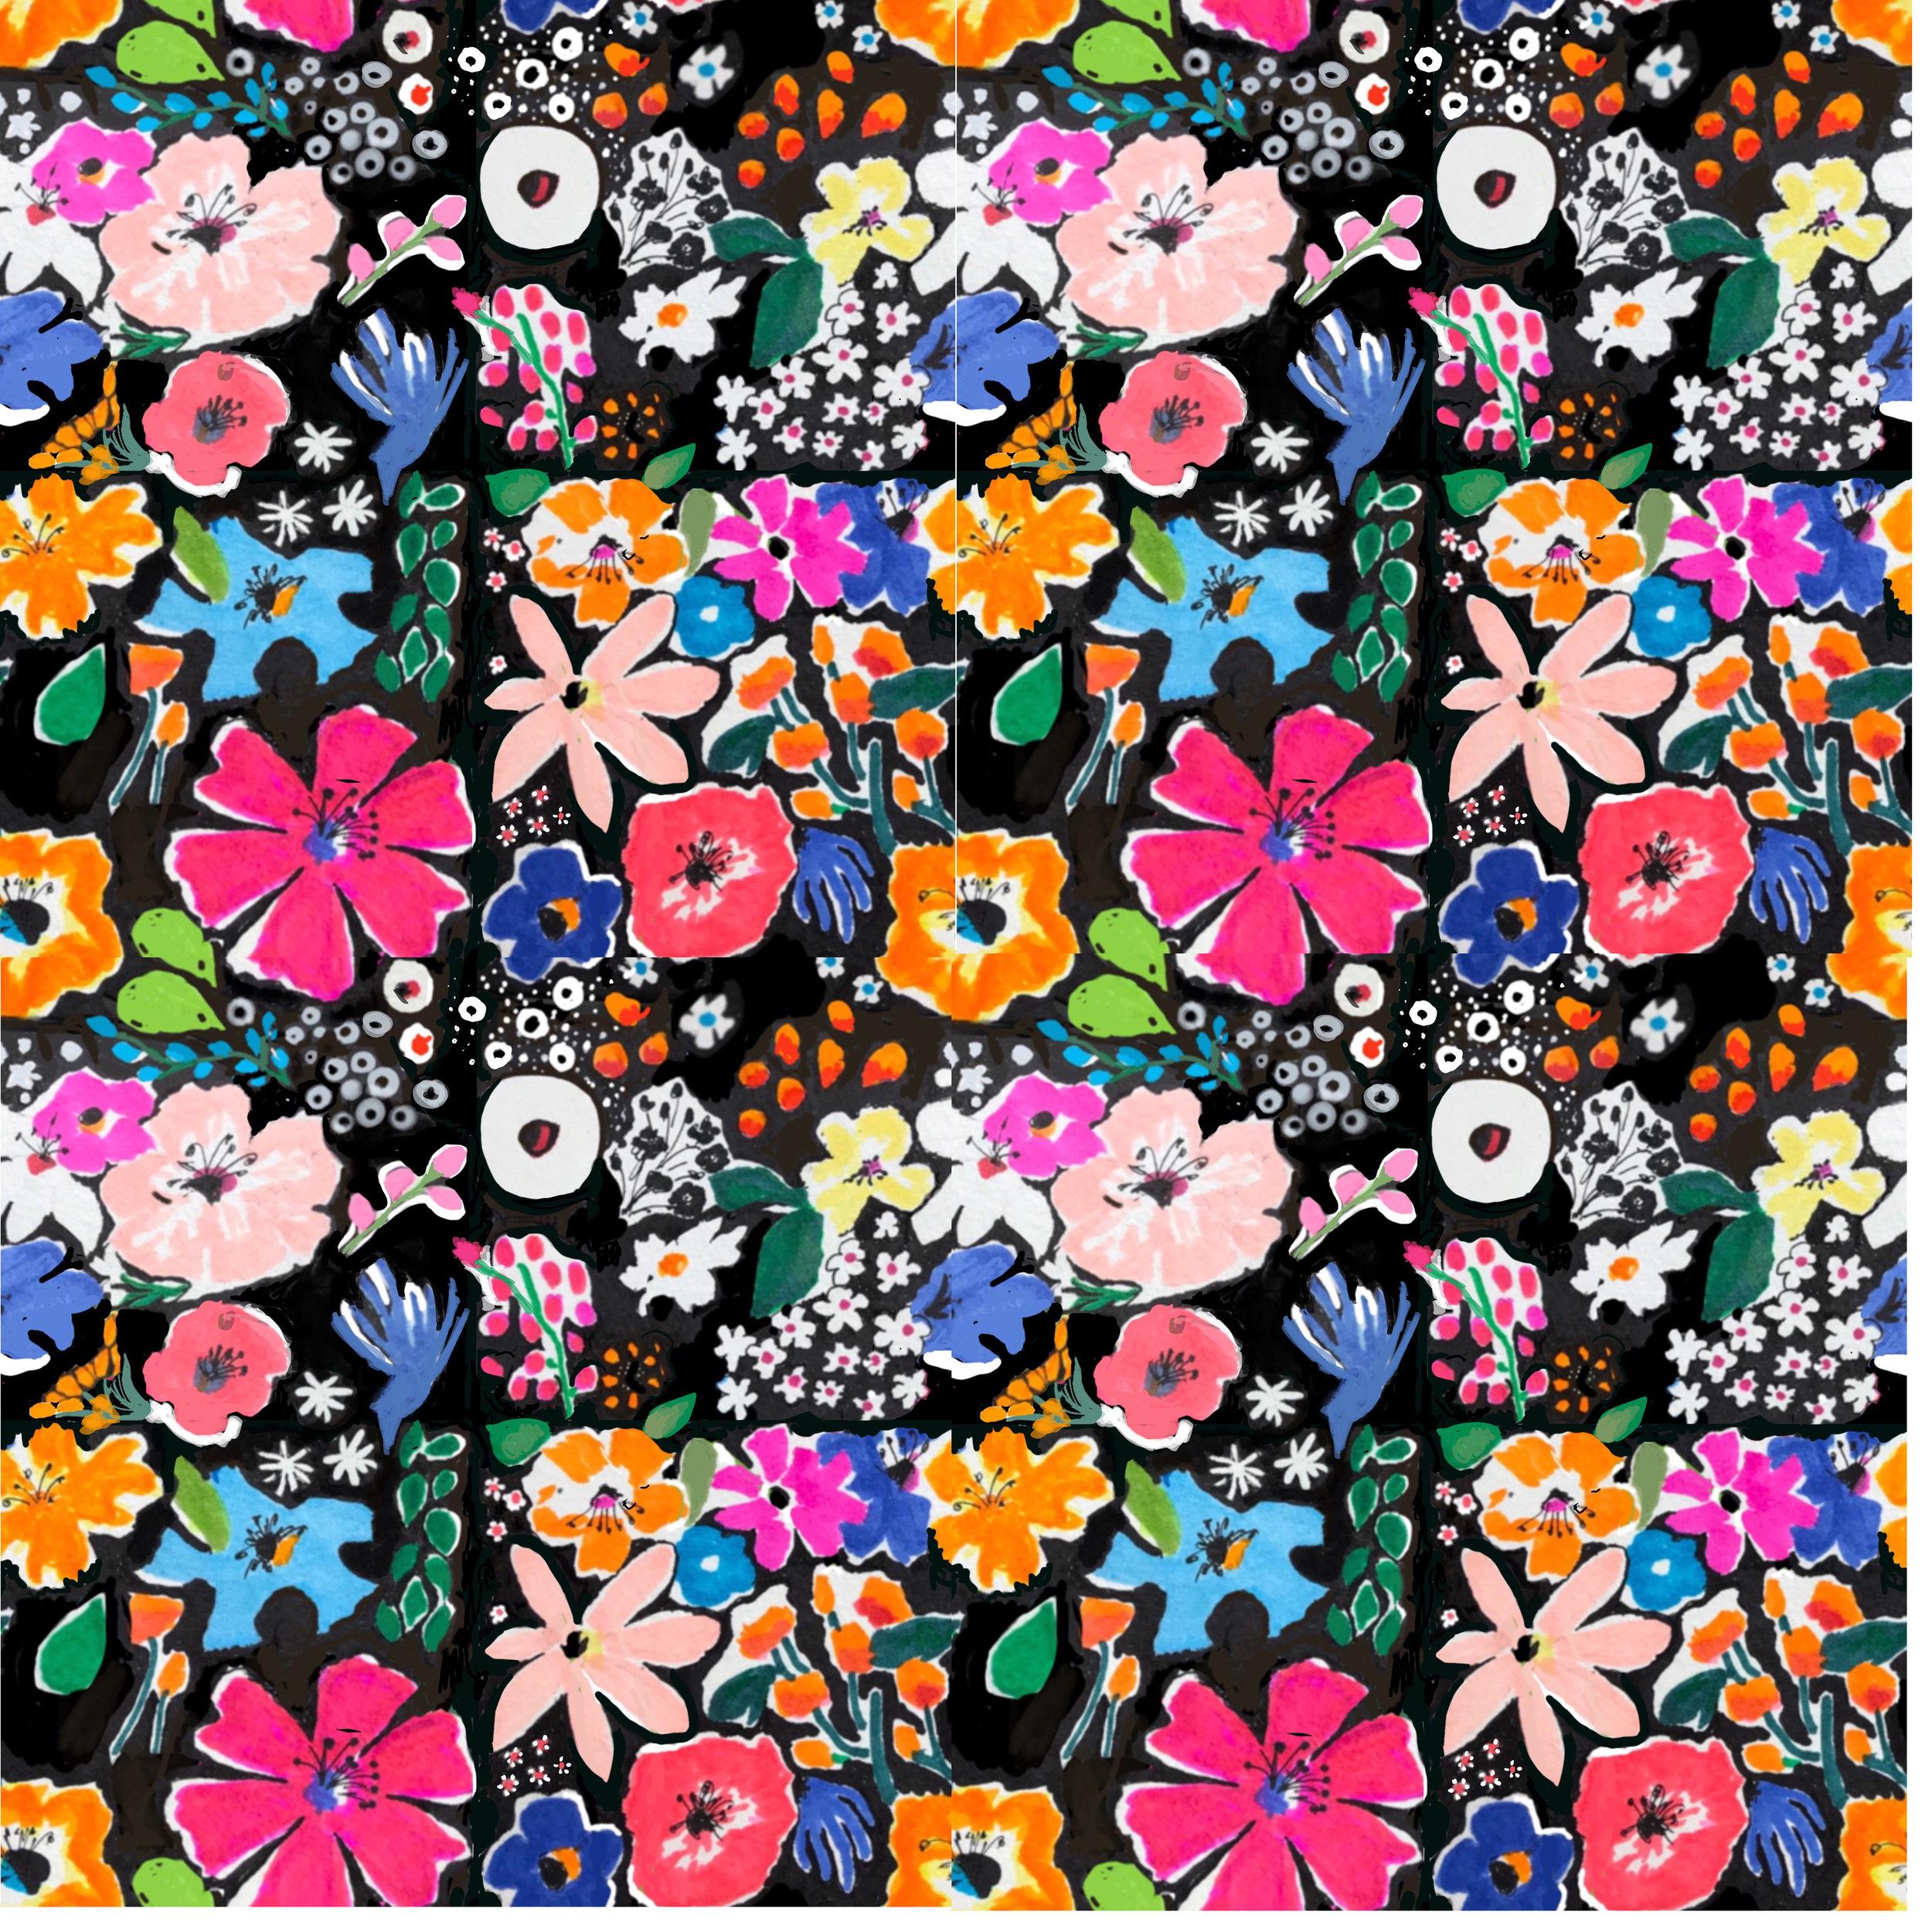 floral-pattern2.jpg